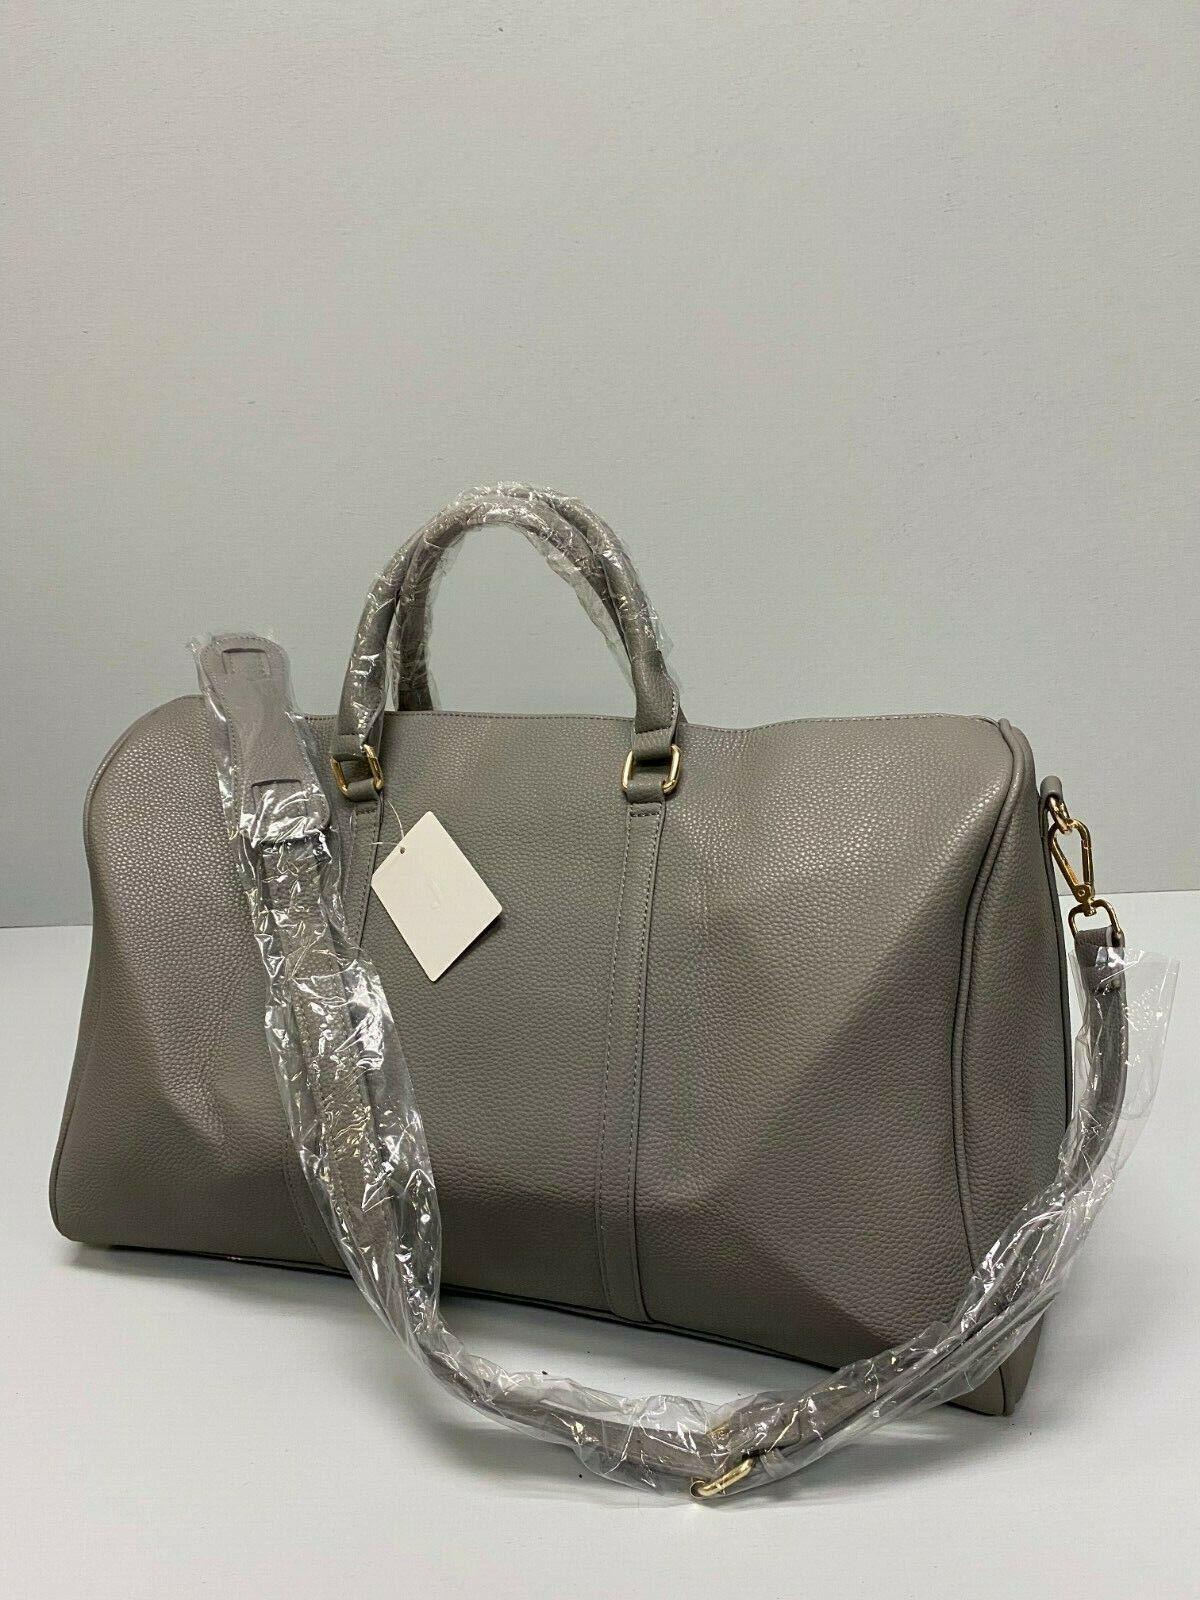 NEW Grey Faux Leather Duffel Weekender Travel Bag HD3006GY C